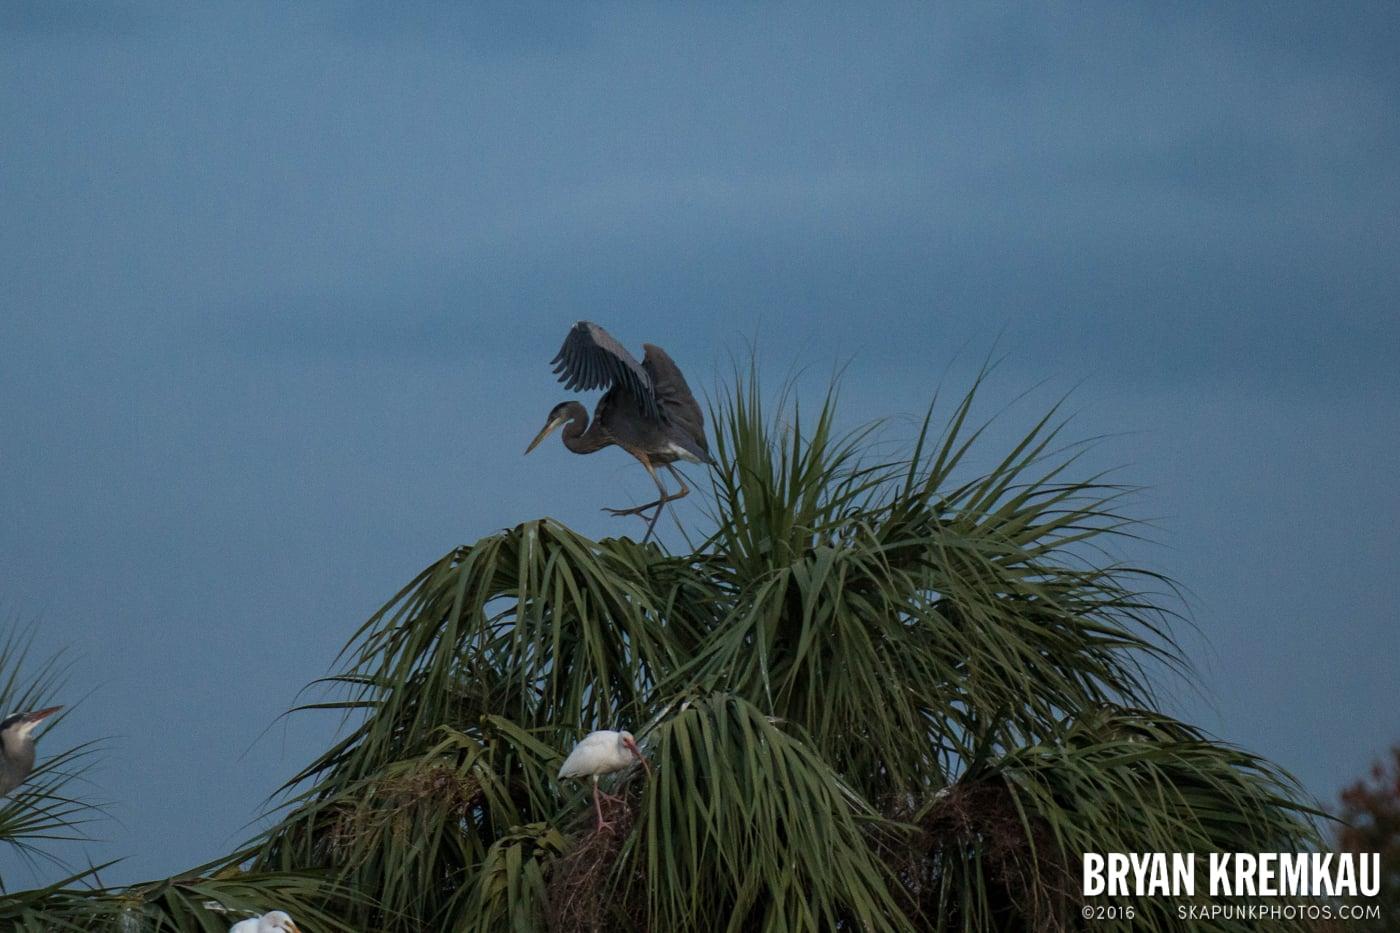 Sunsets, Astrophotography & Birds @ Venice, Florida - 10.25.14 - 11.5.14 (8)